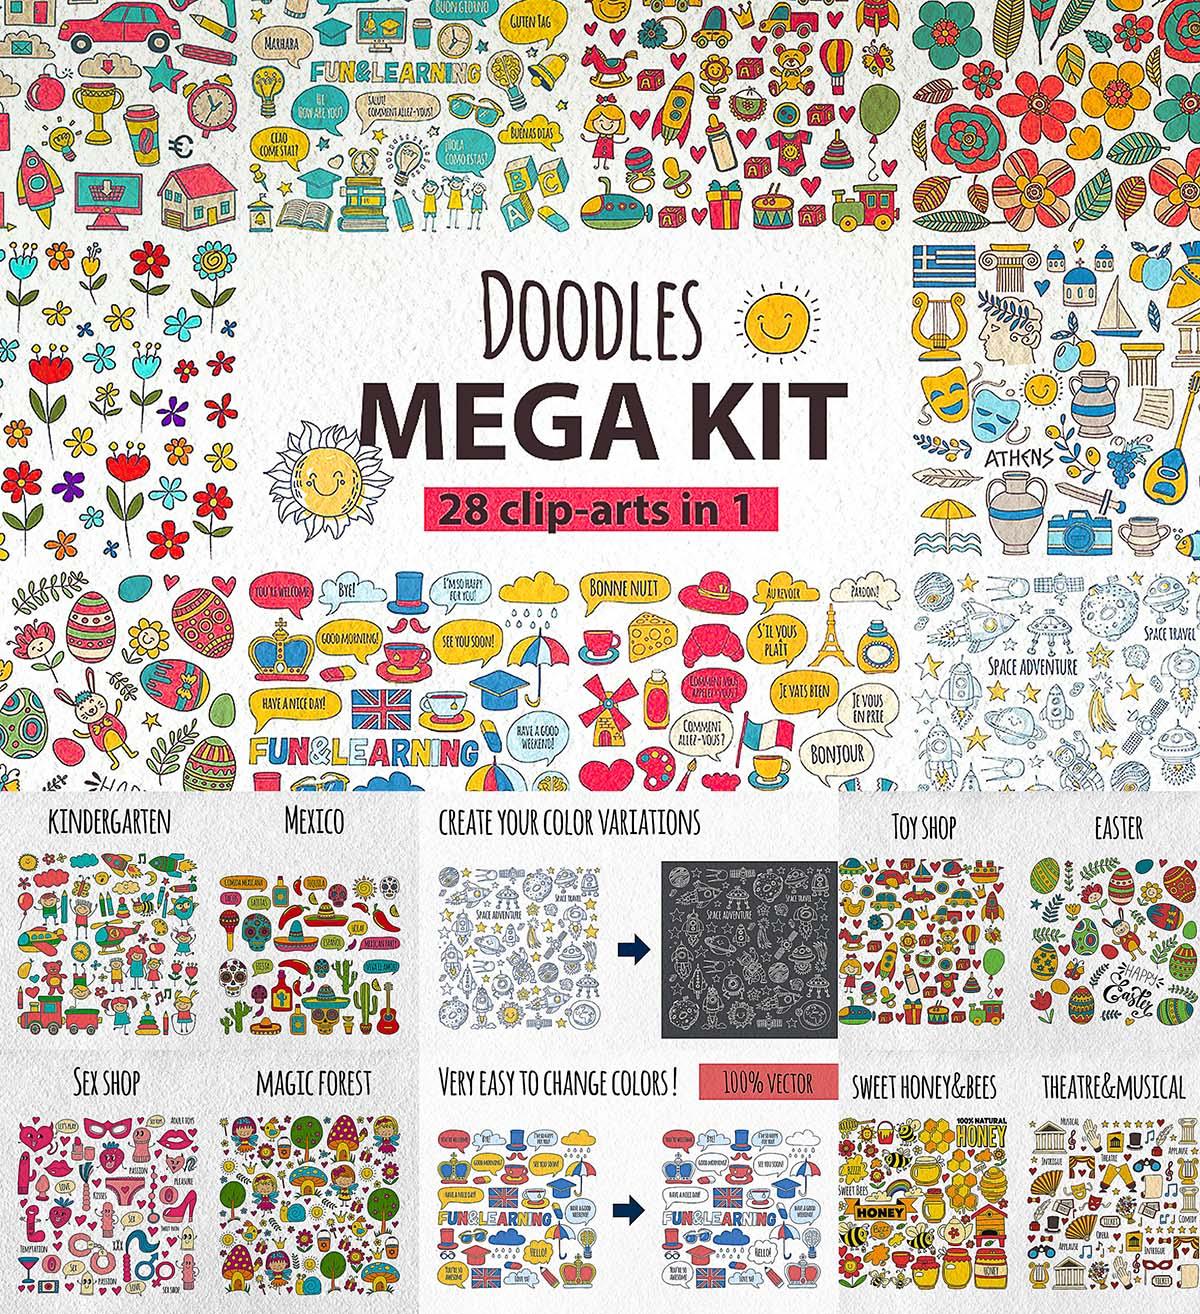 Doodle mega kit cliparts